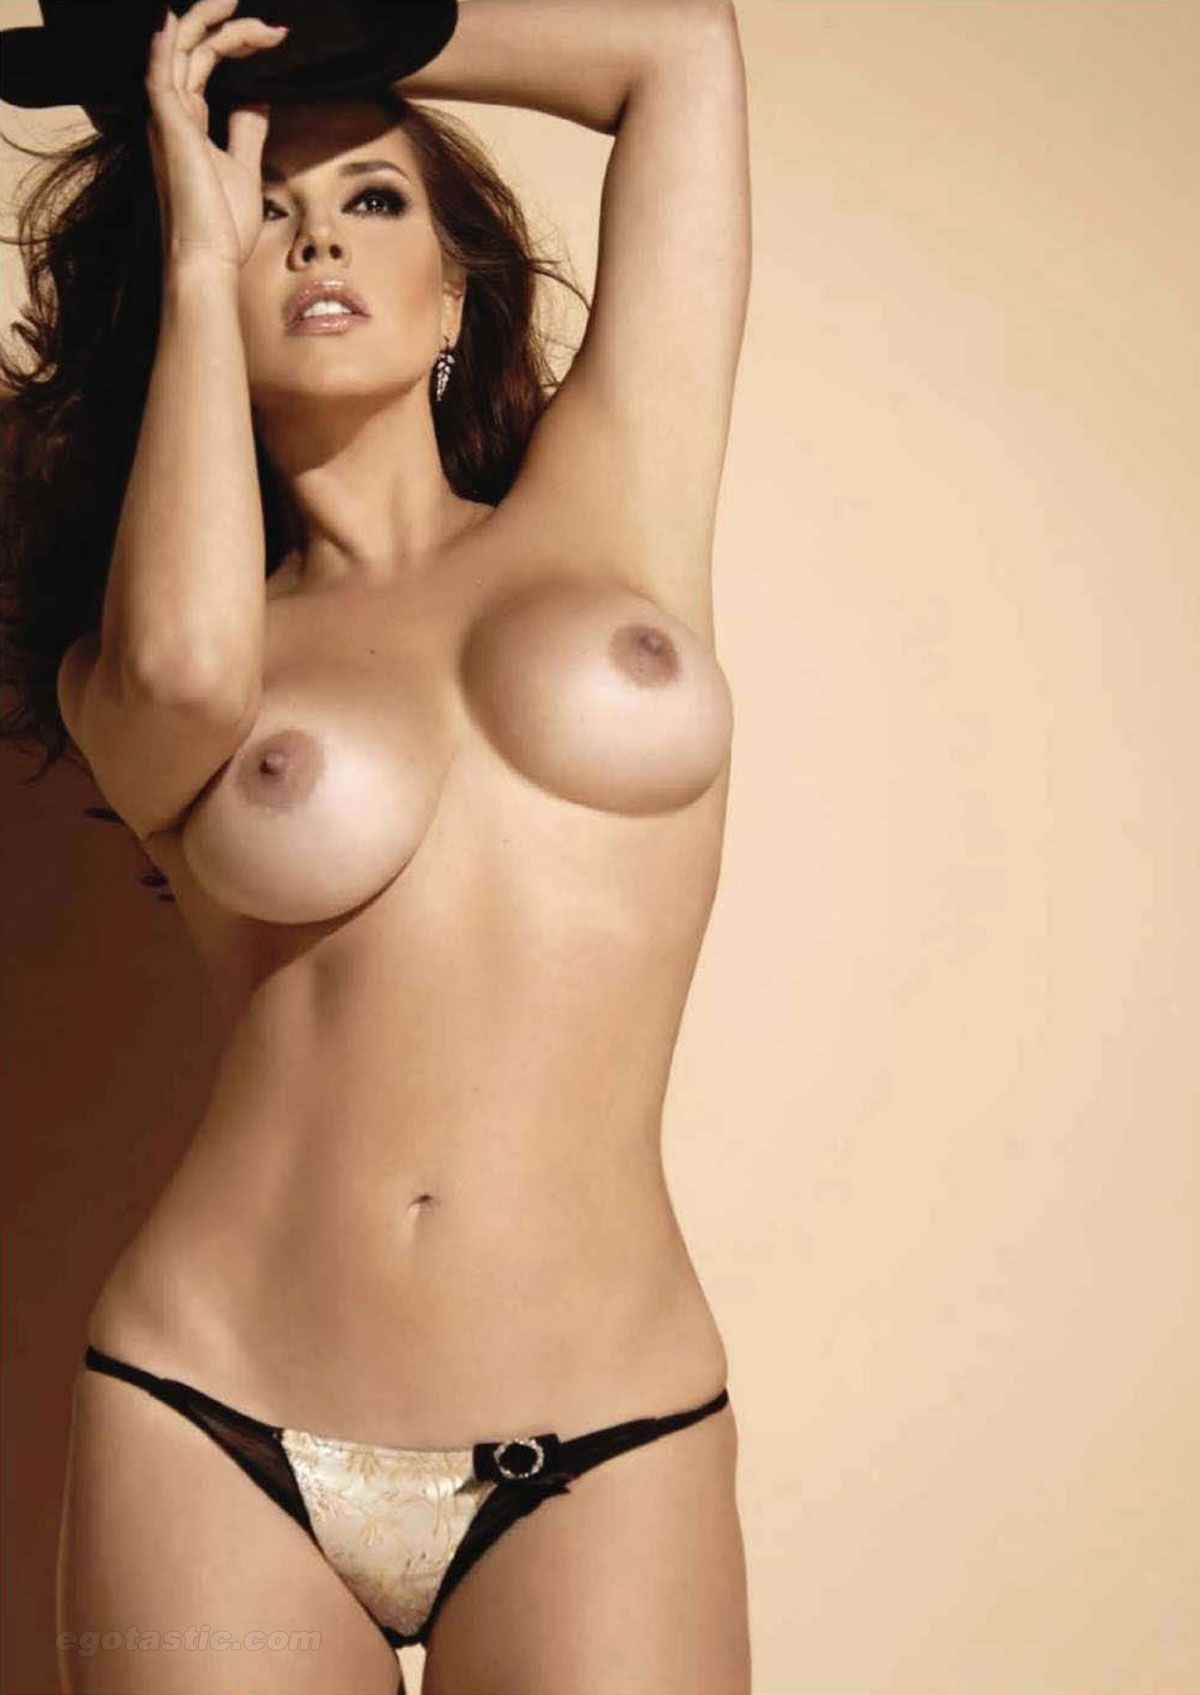 alicia machado big boobs hot